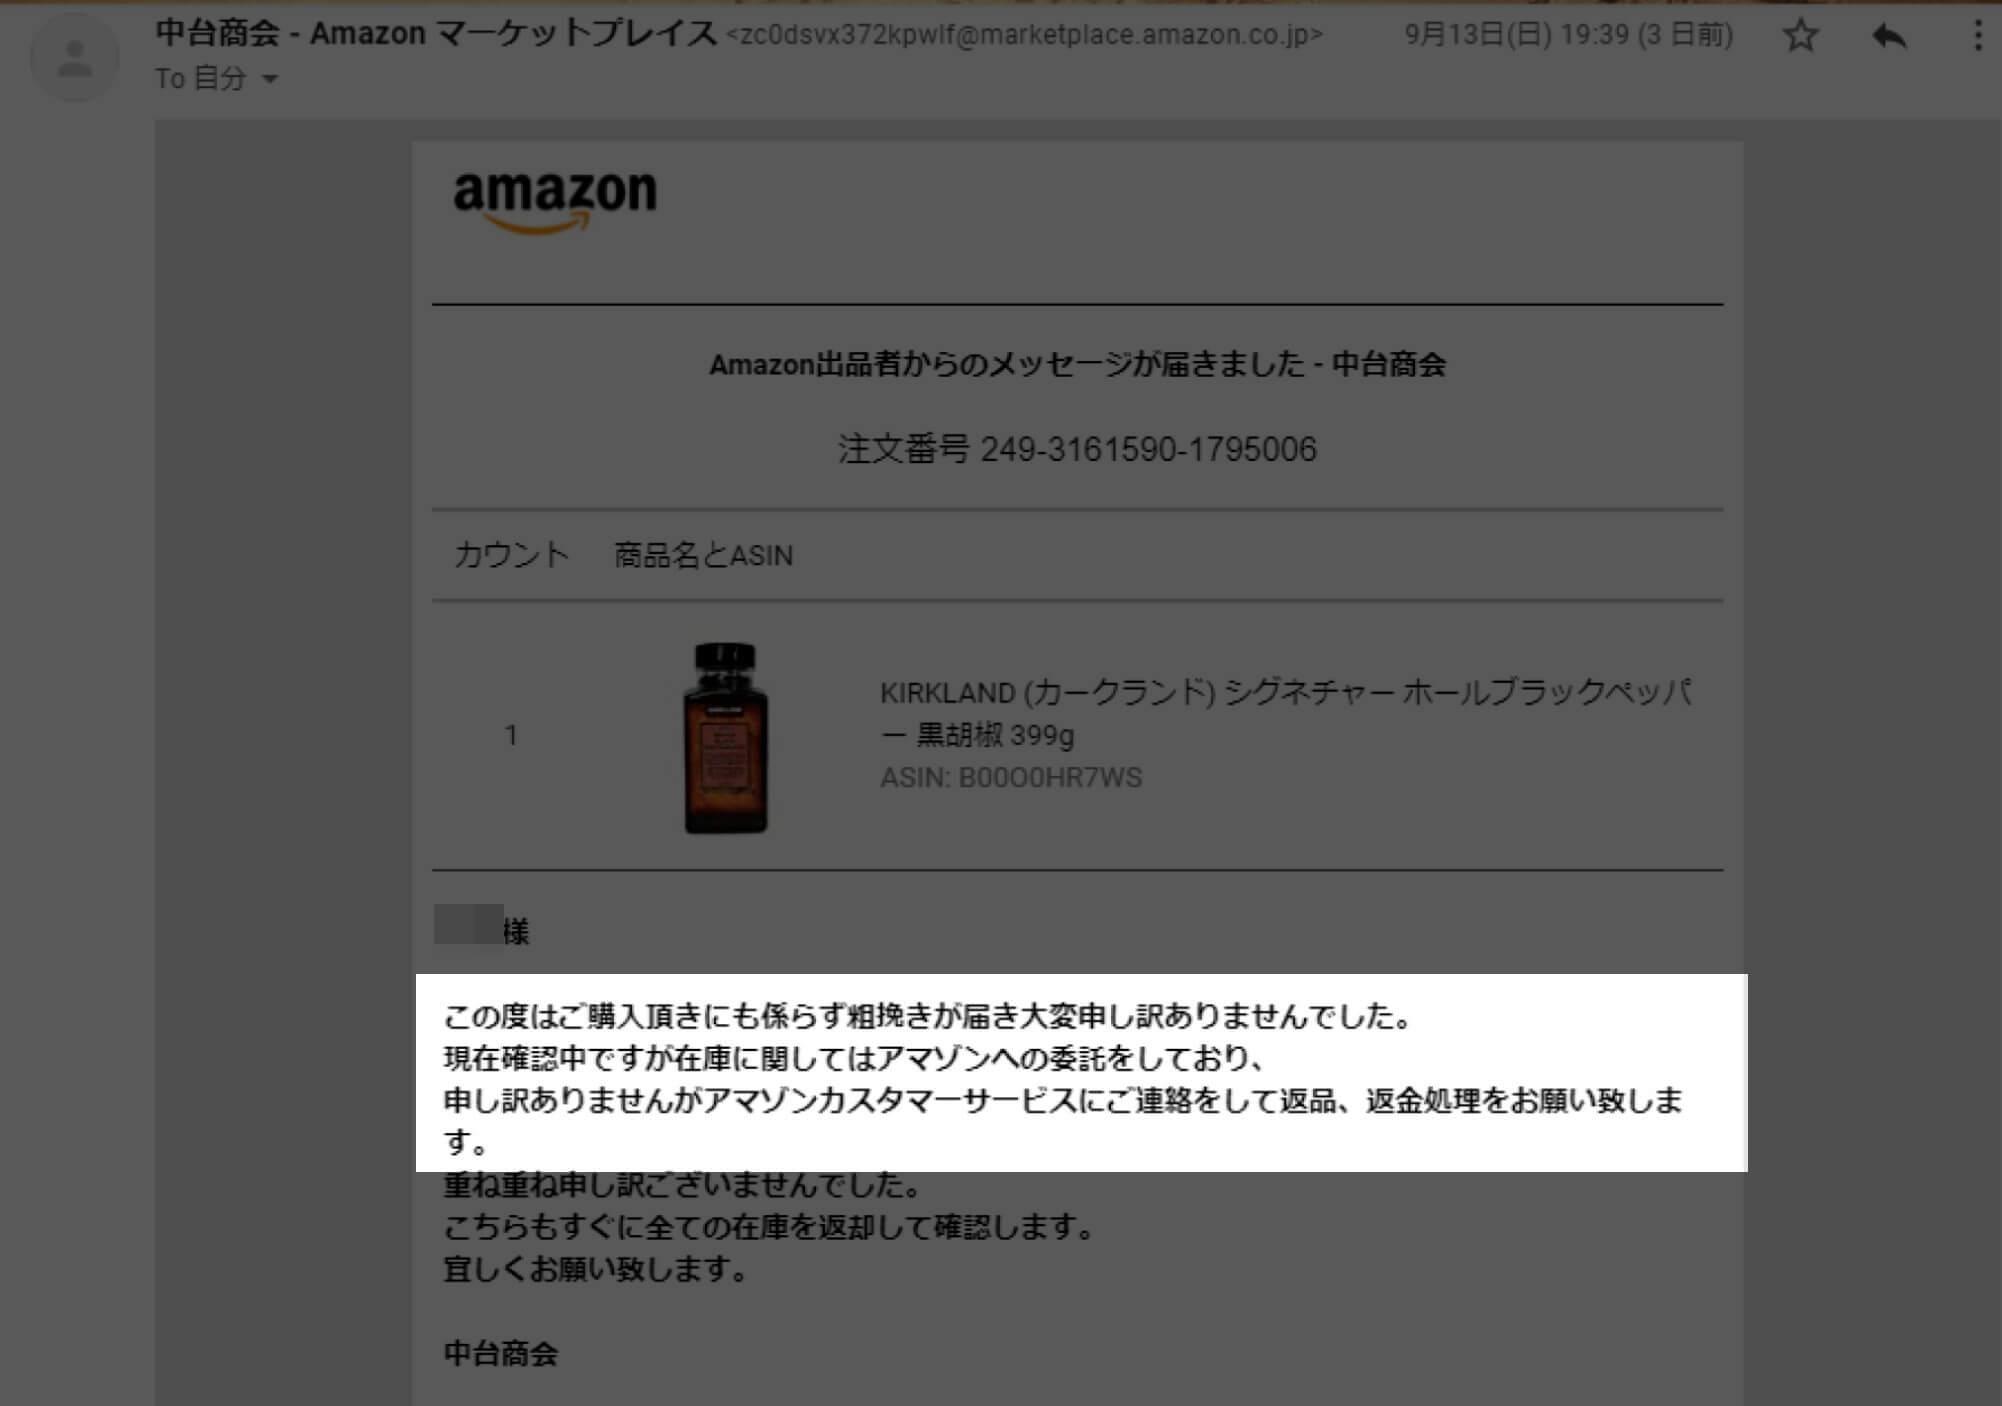 Amazon出品者からのメッセージ